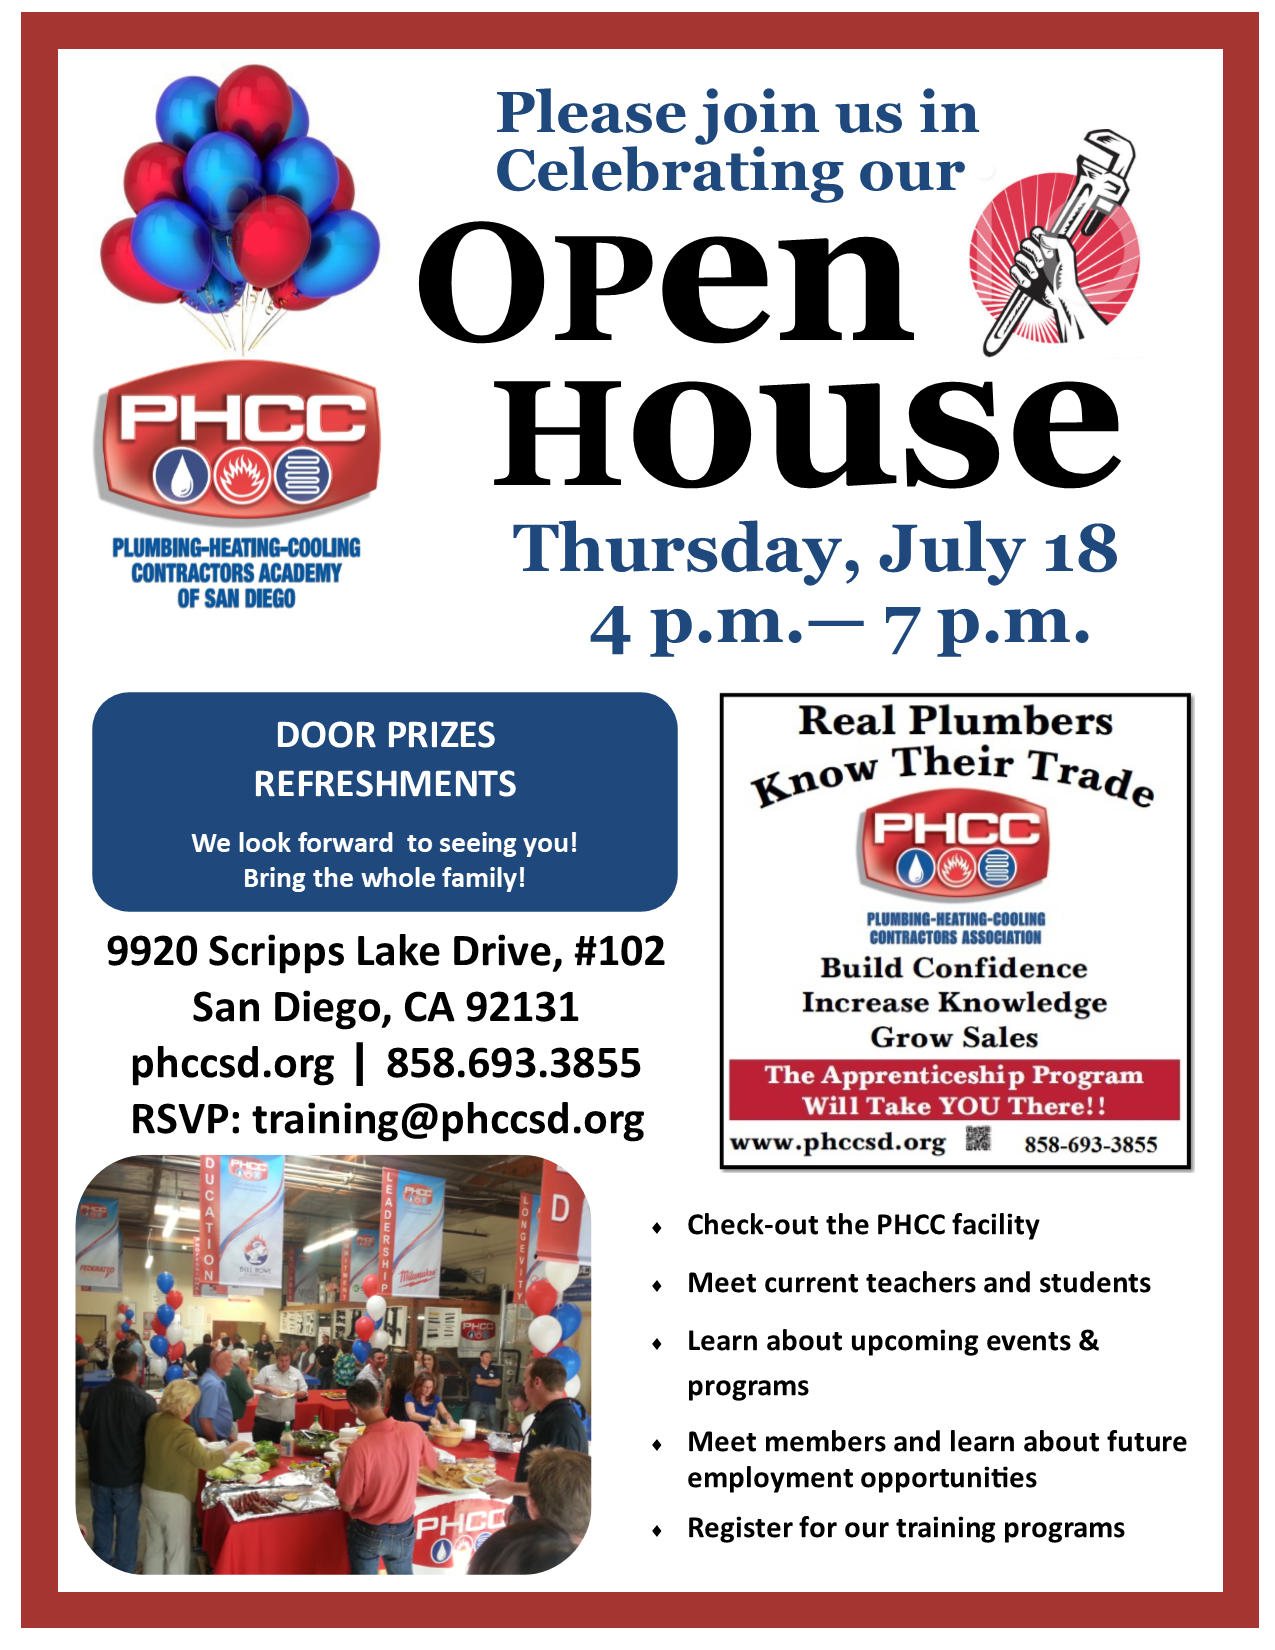 PHCC San Diego Open House 2019